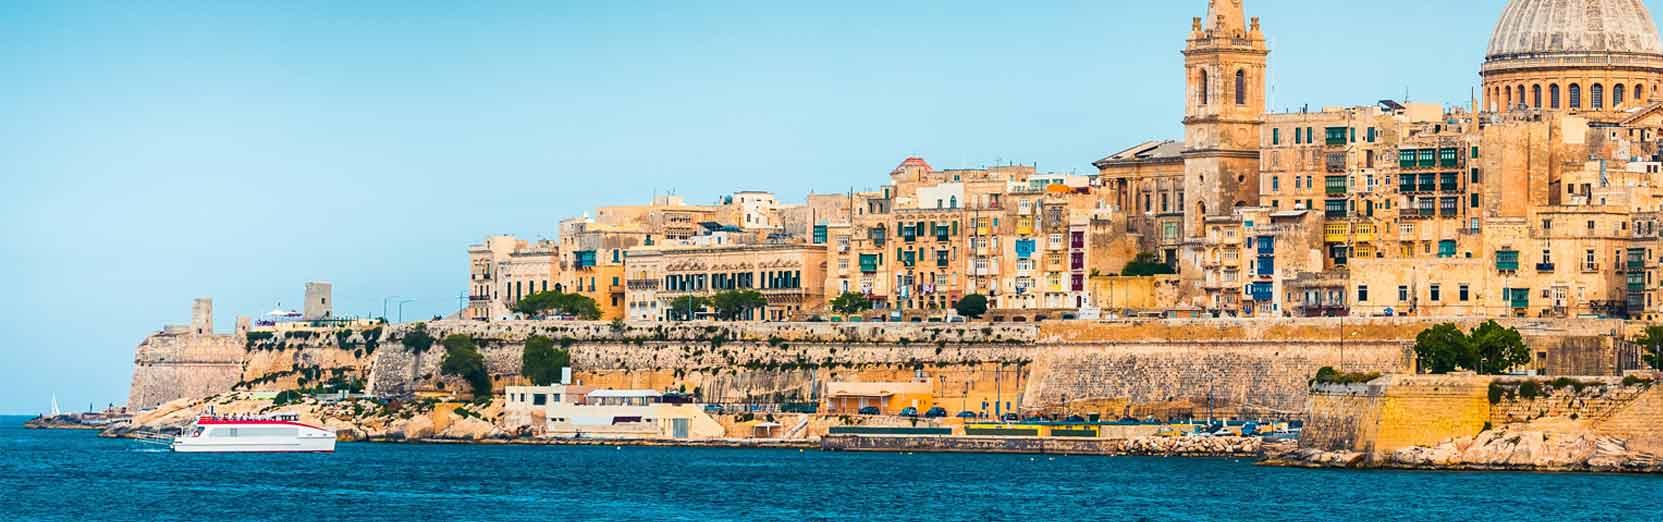 Auto mieten in Malta